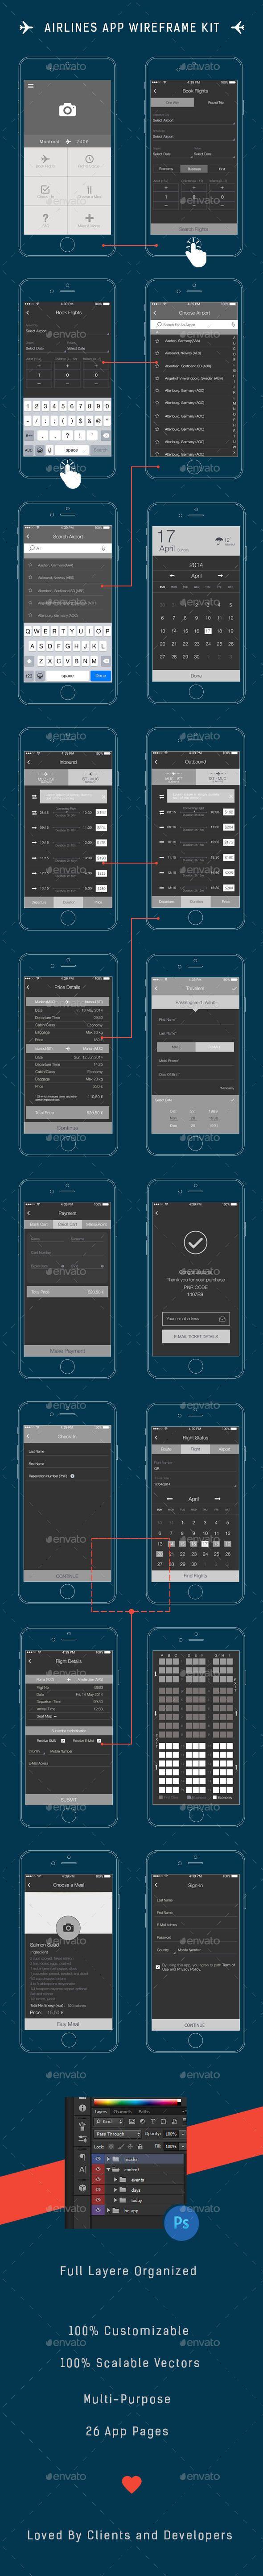 Airlines App Wireframe Kit U?/Ux